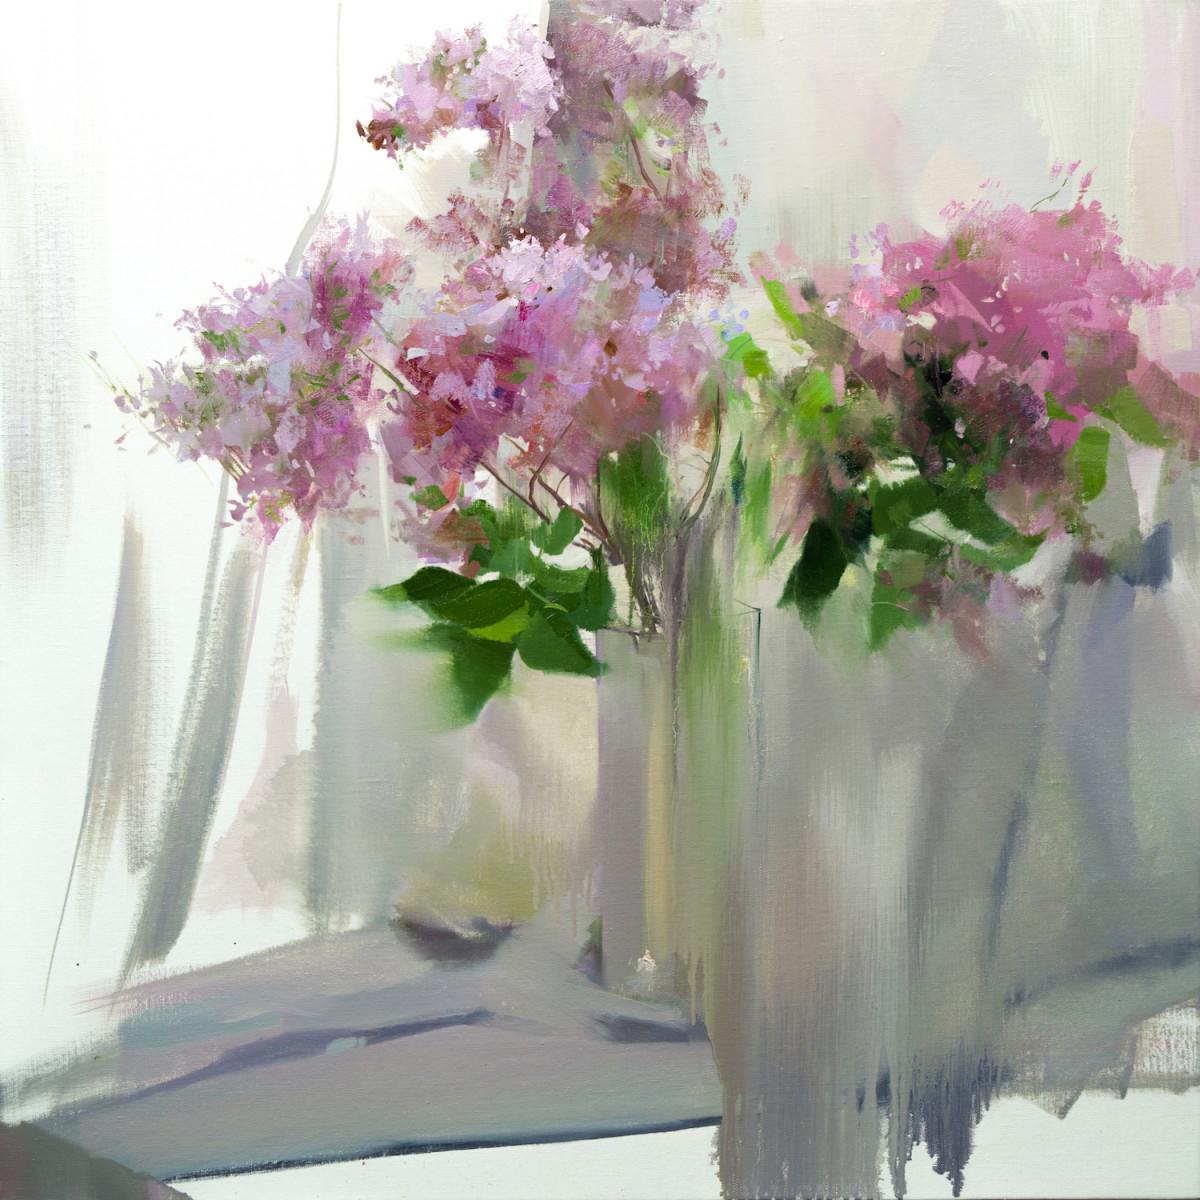 картина натюрморт с цветами в вазе сирень